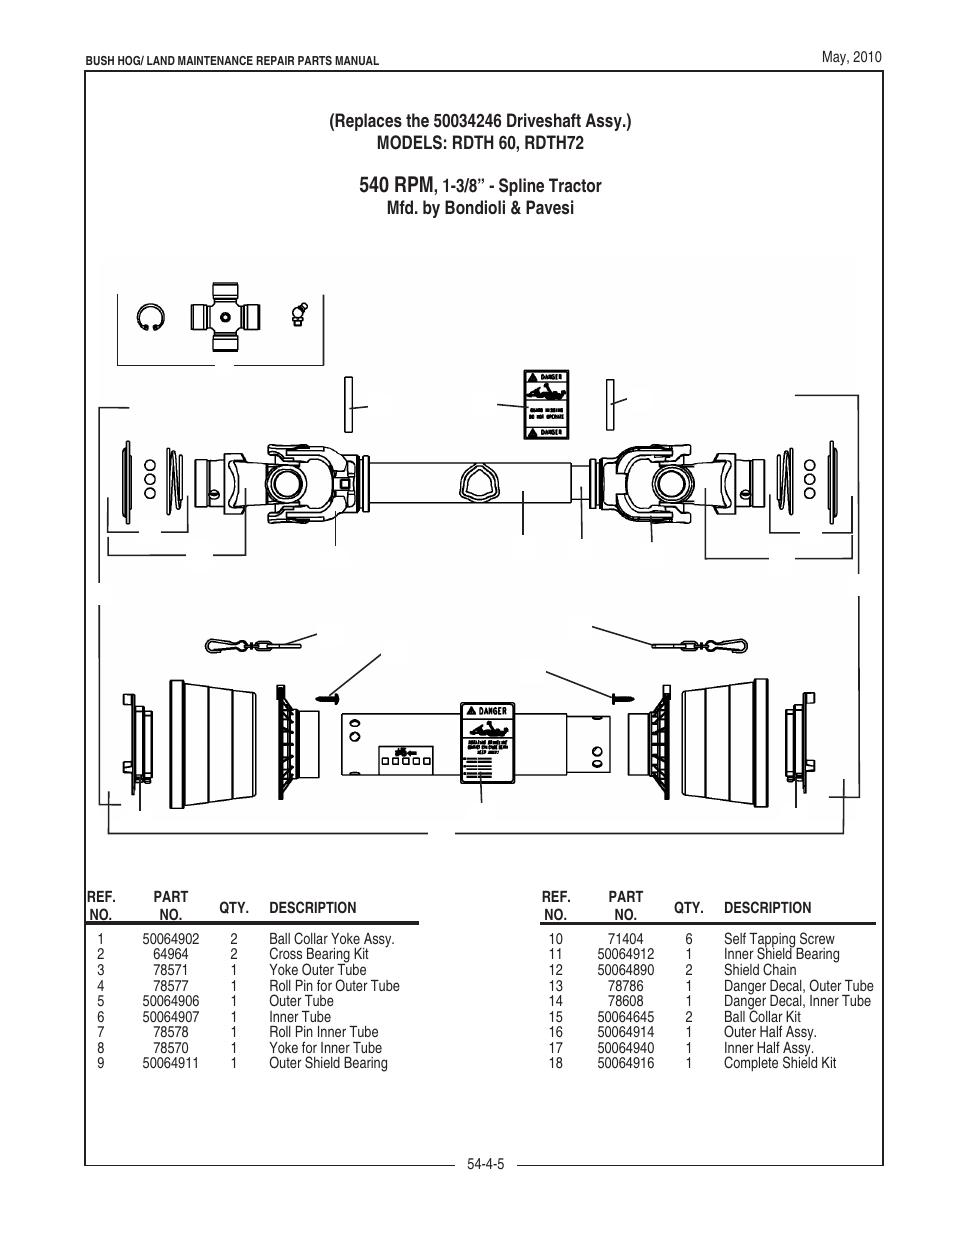 540 rpm | Bush Hog RDTH SERIES RDTH 72 User Manual | Page 19